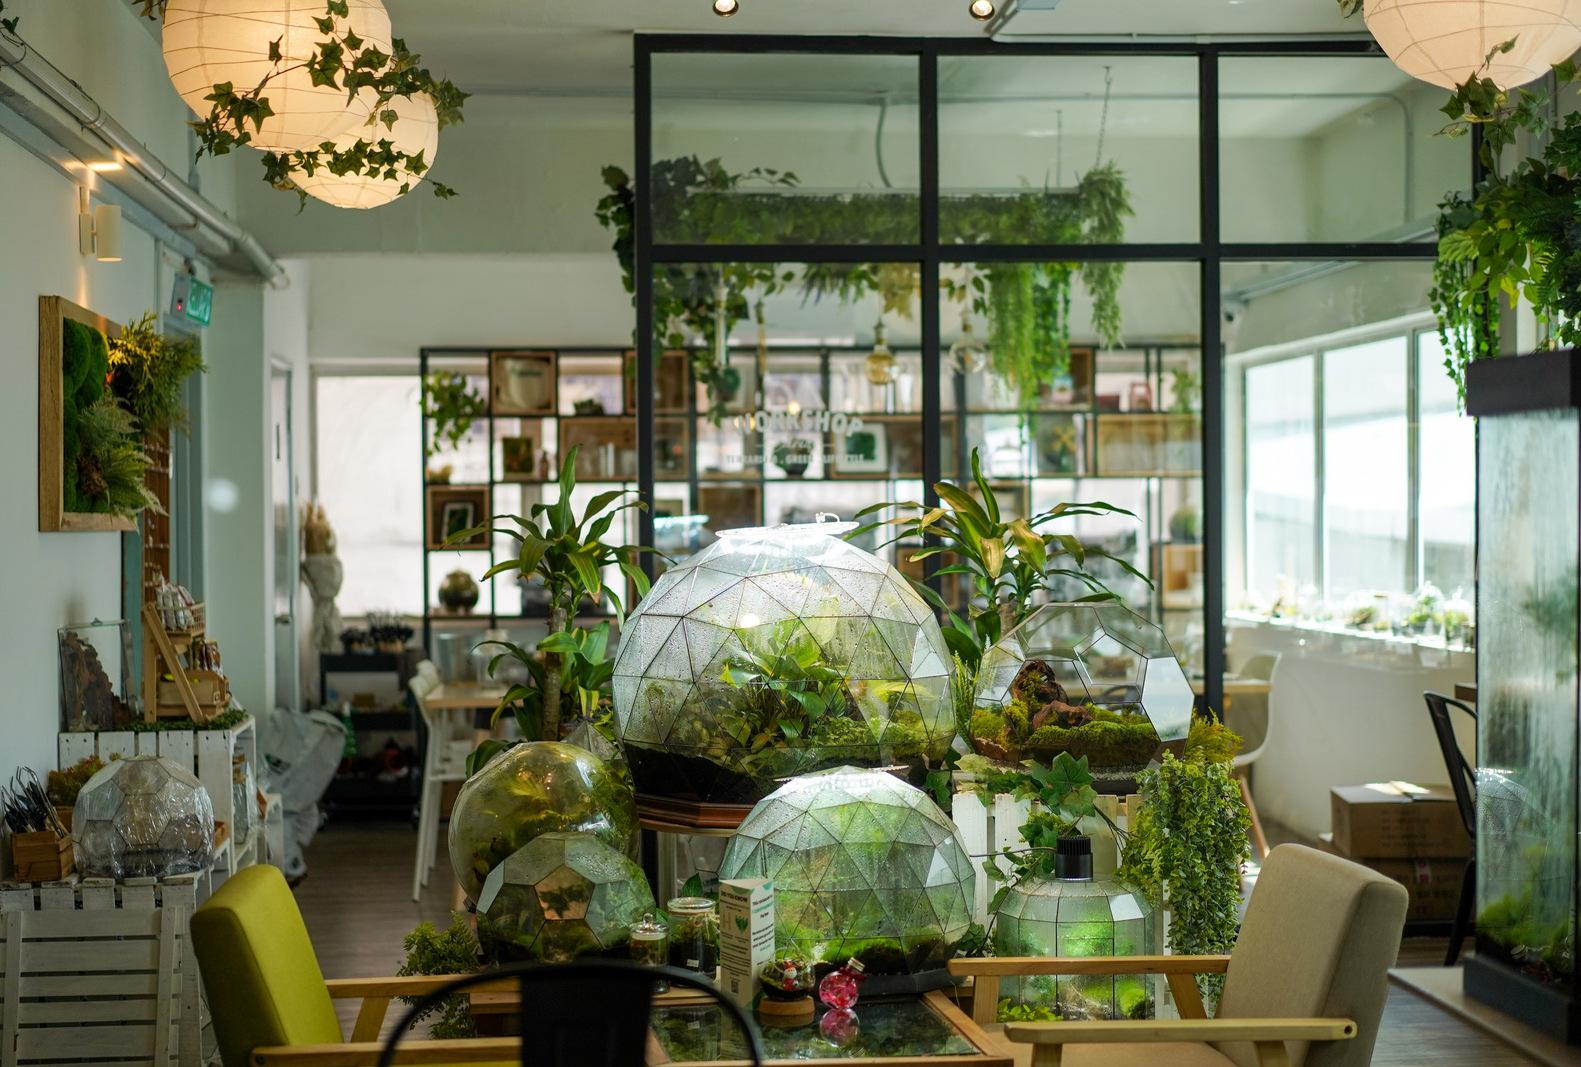 mossarium lifestyle cafe, damansara uptown